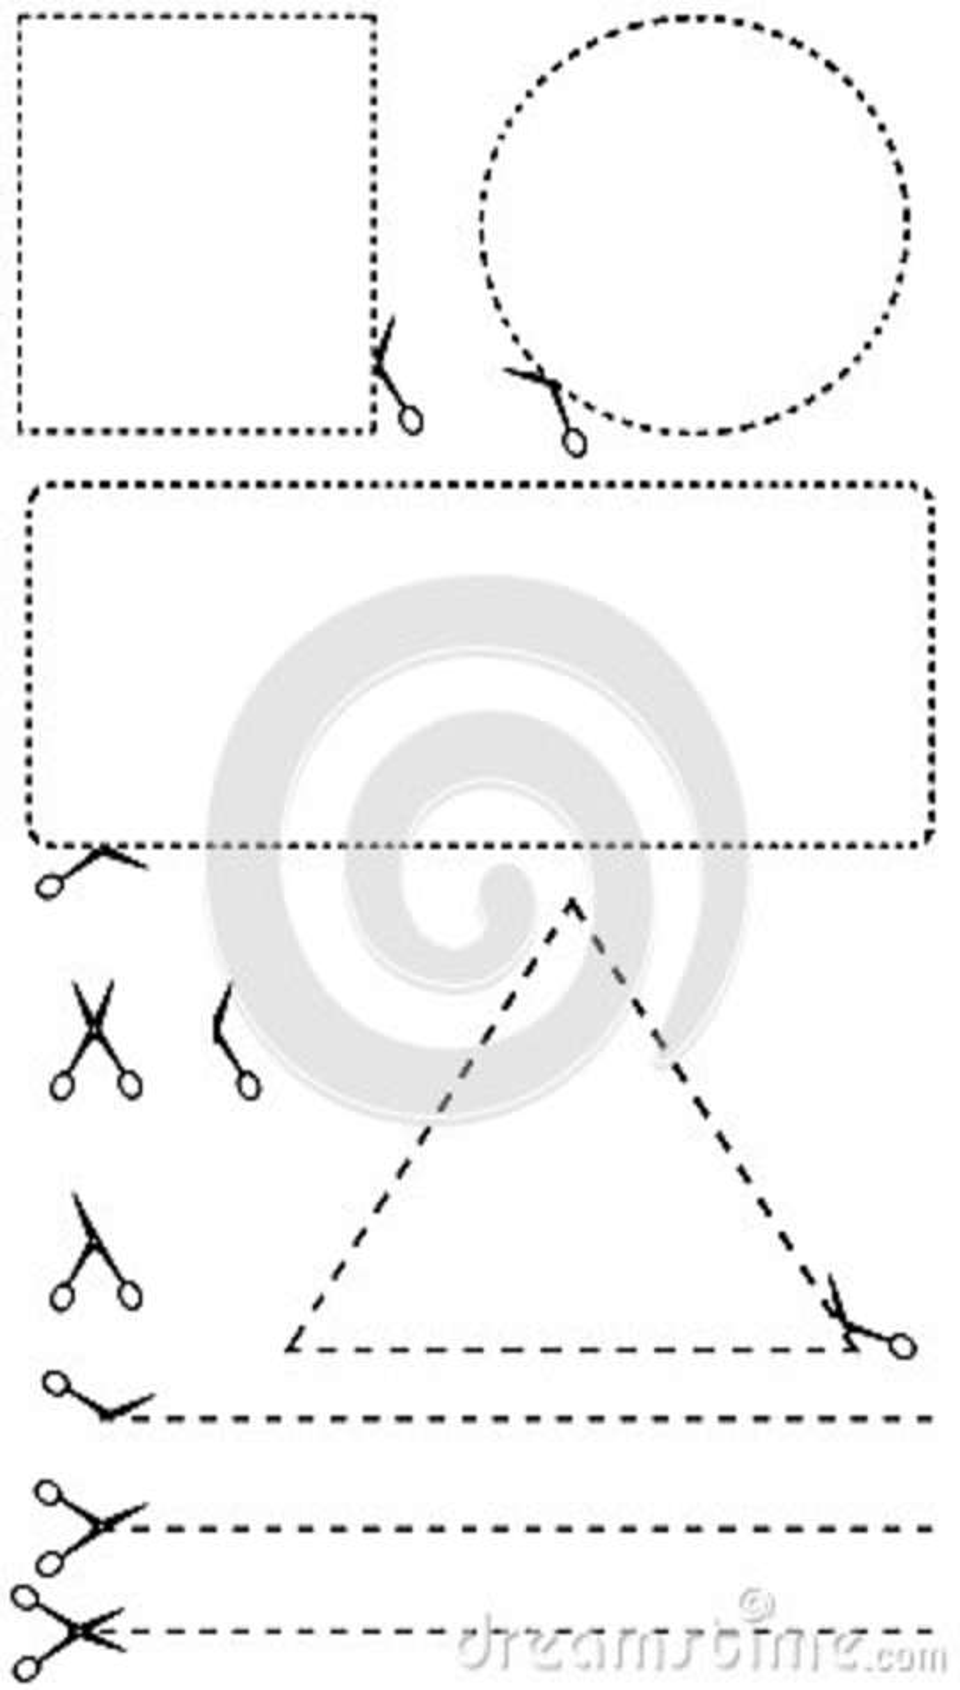 Líneas de corte